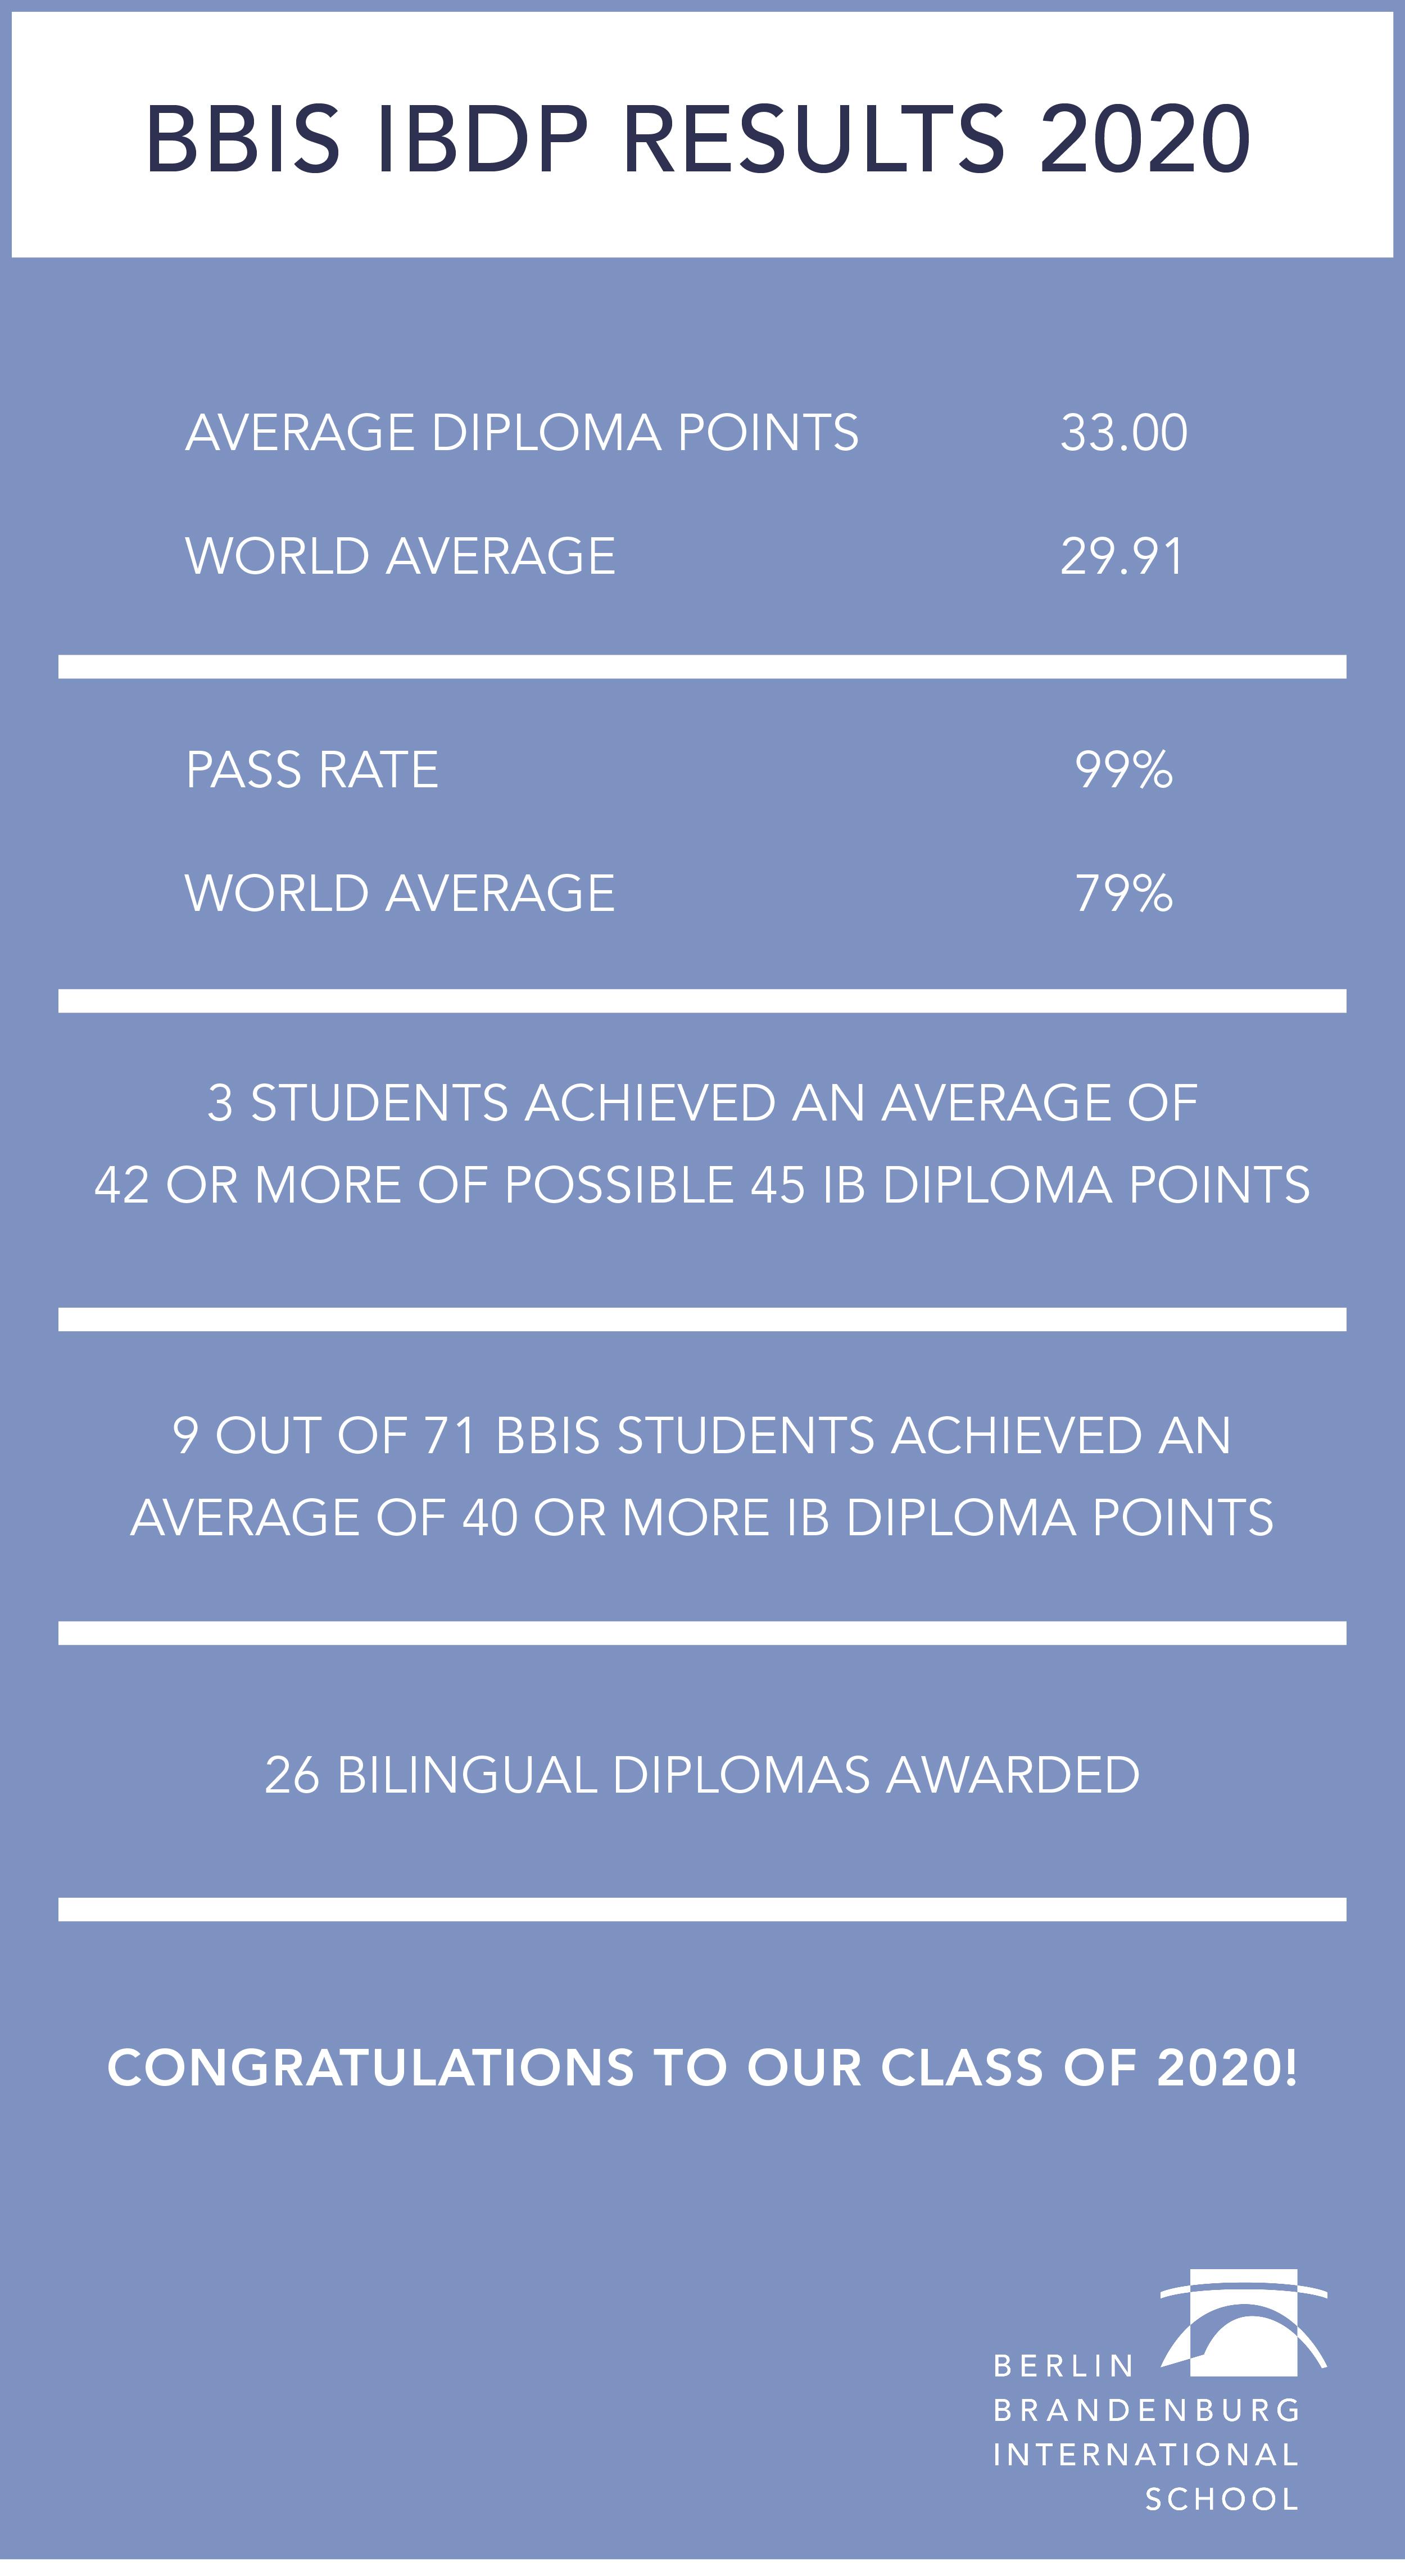 BBIS IBDP Results 2020